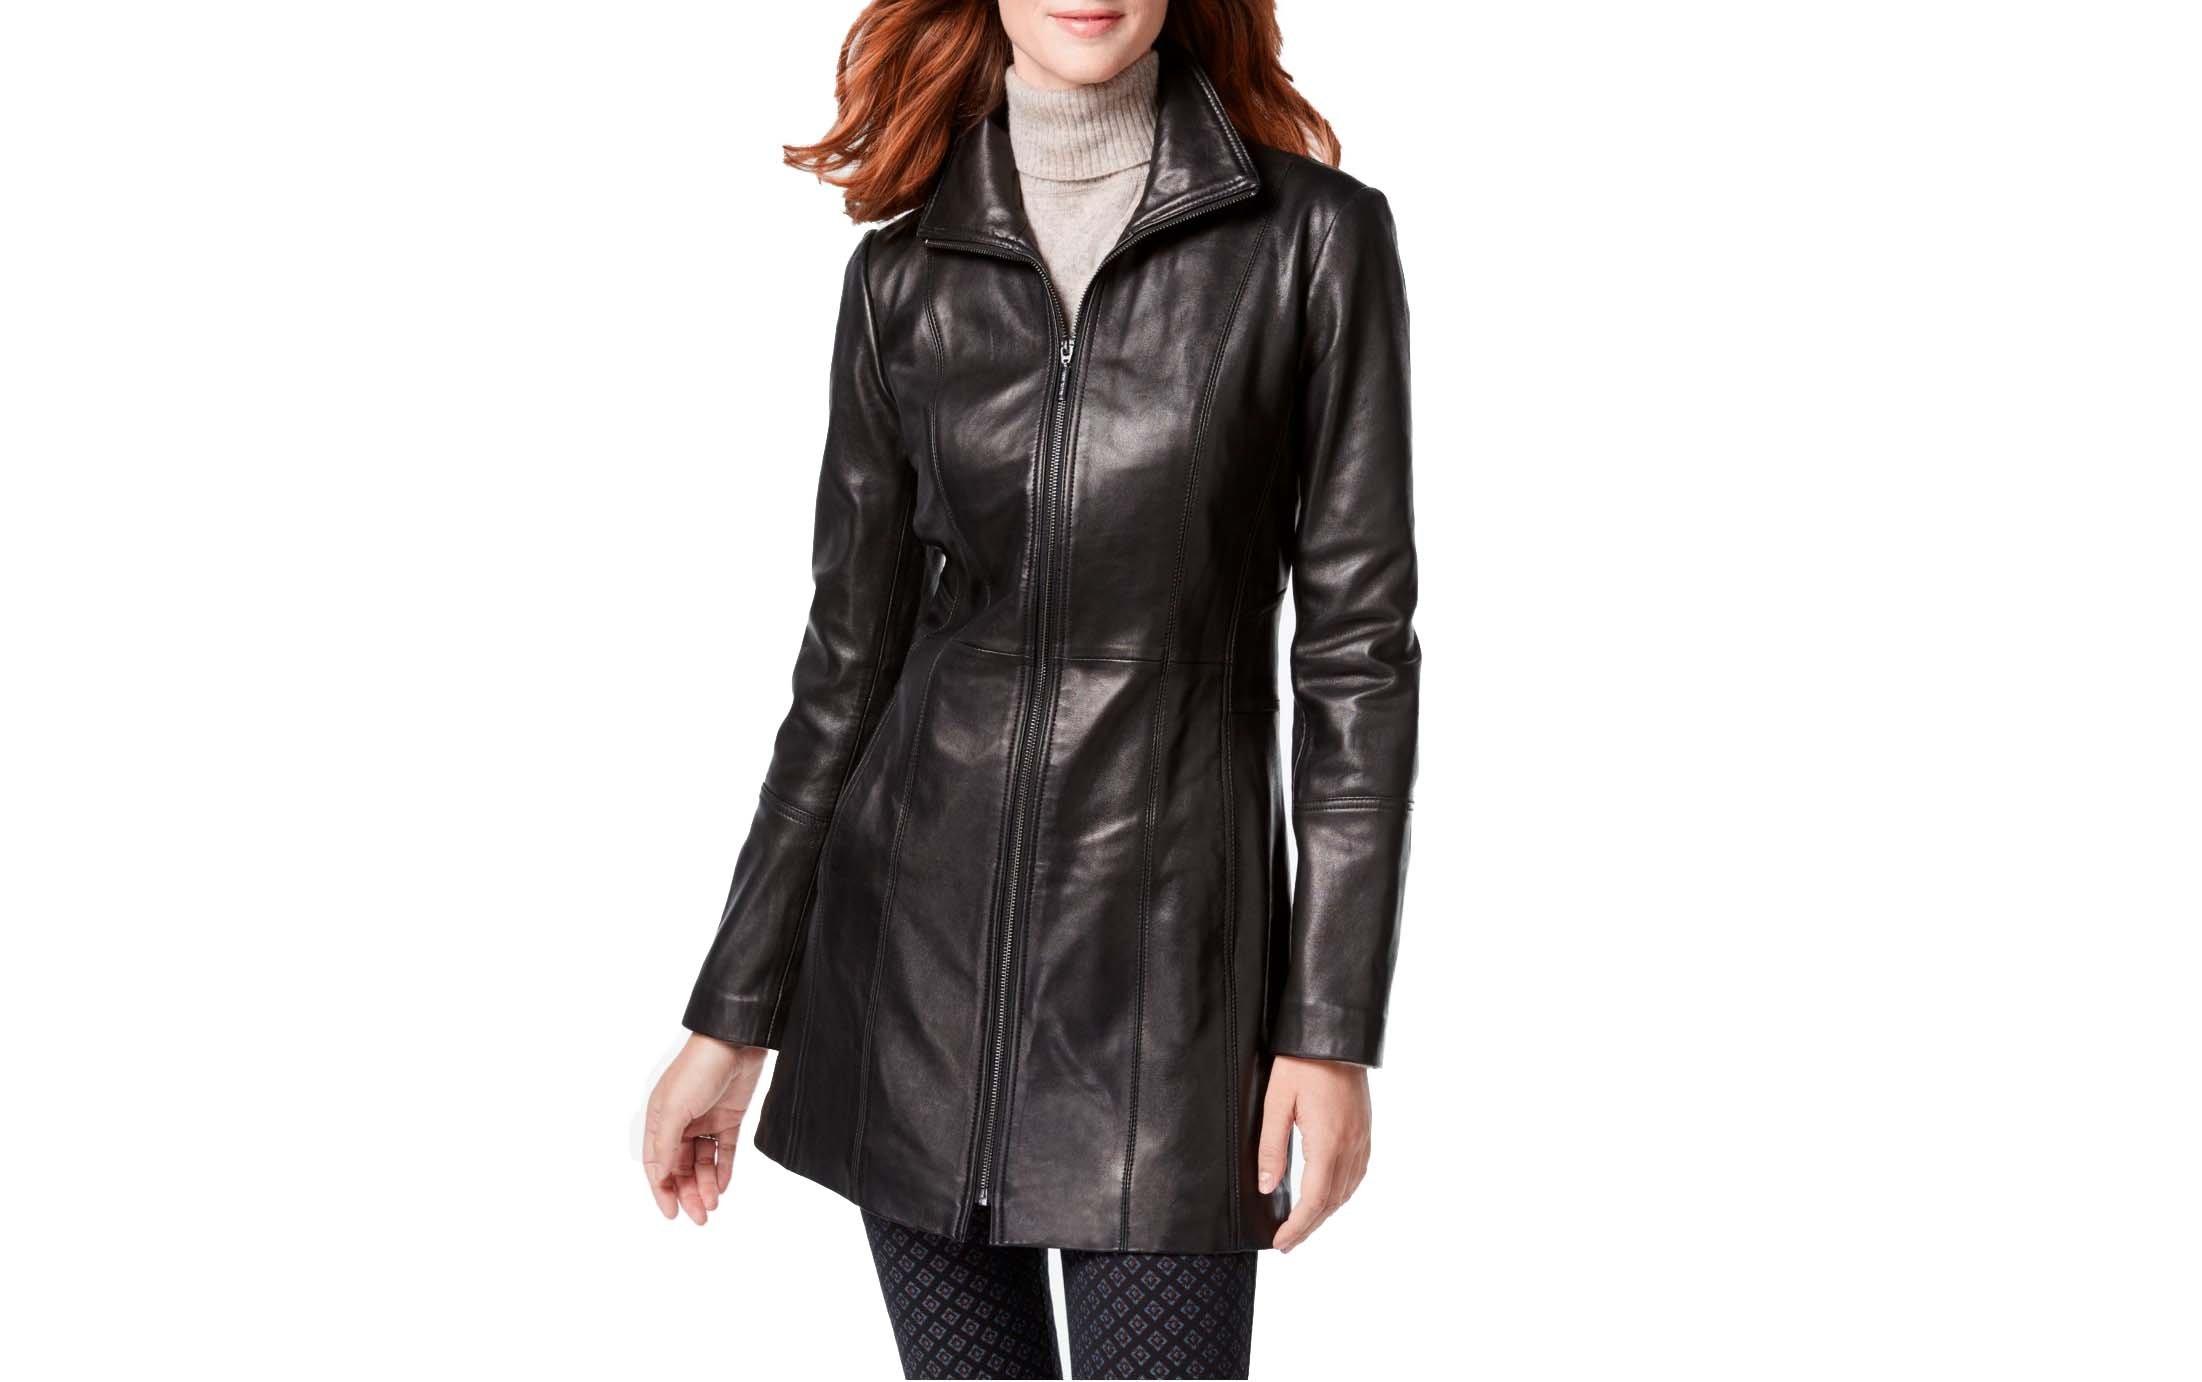 ANNE KLEIN Mid-Length Zip Front Leather Jacket-Black-M